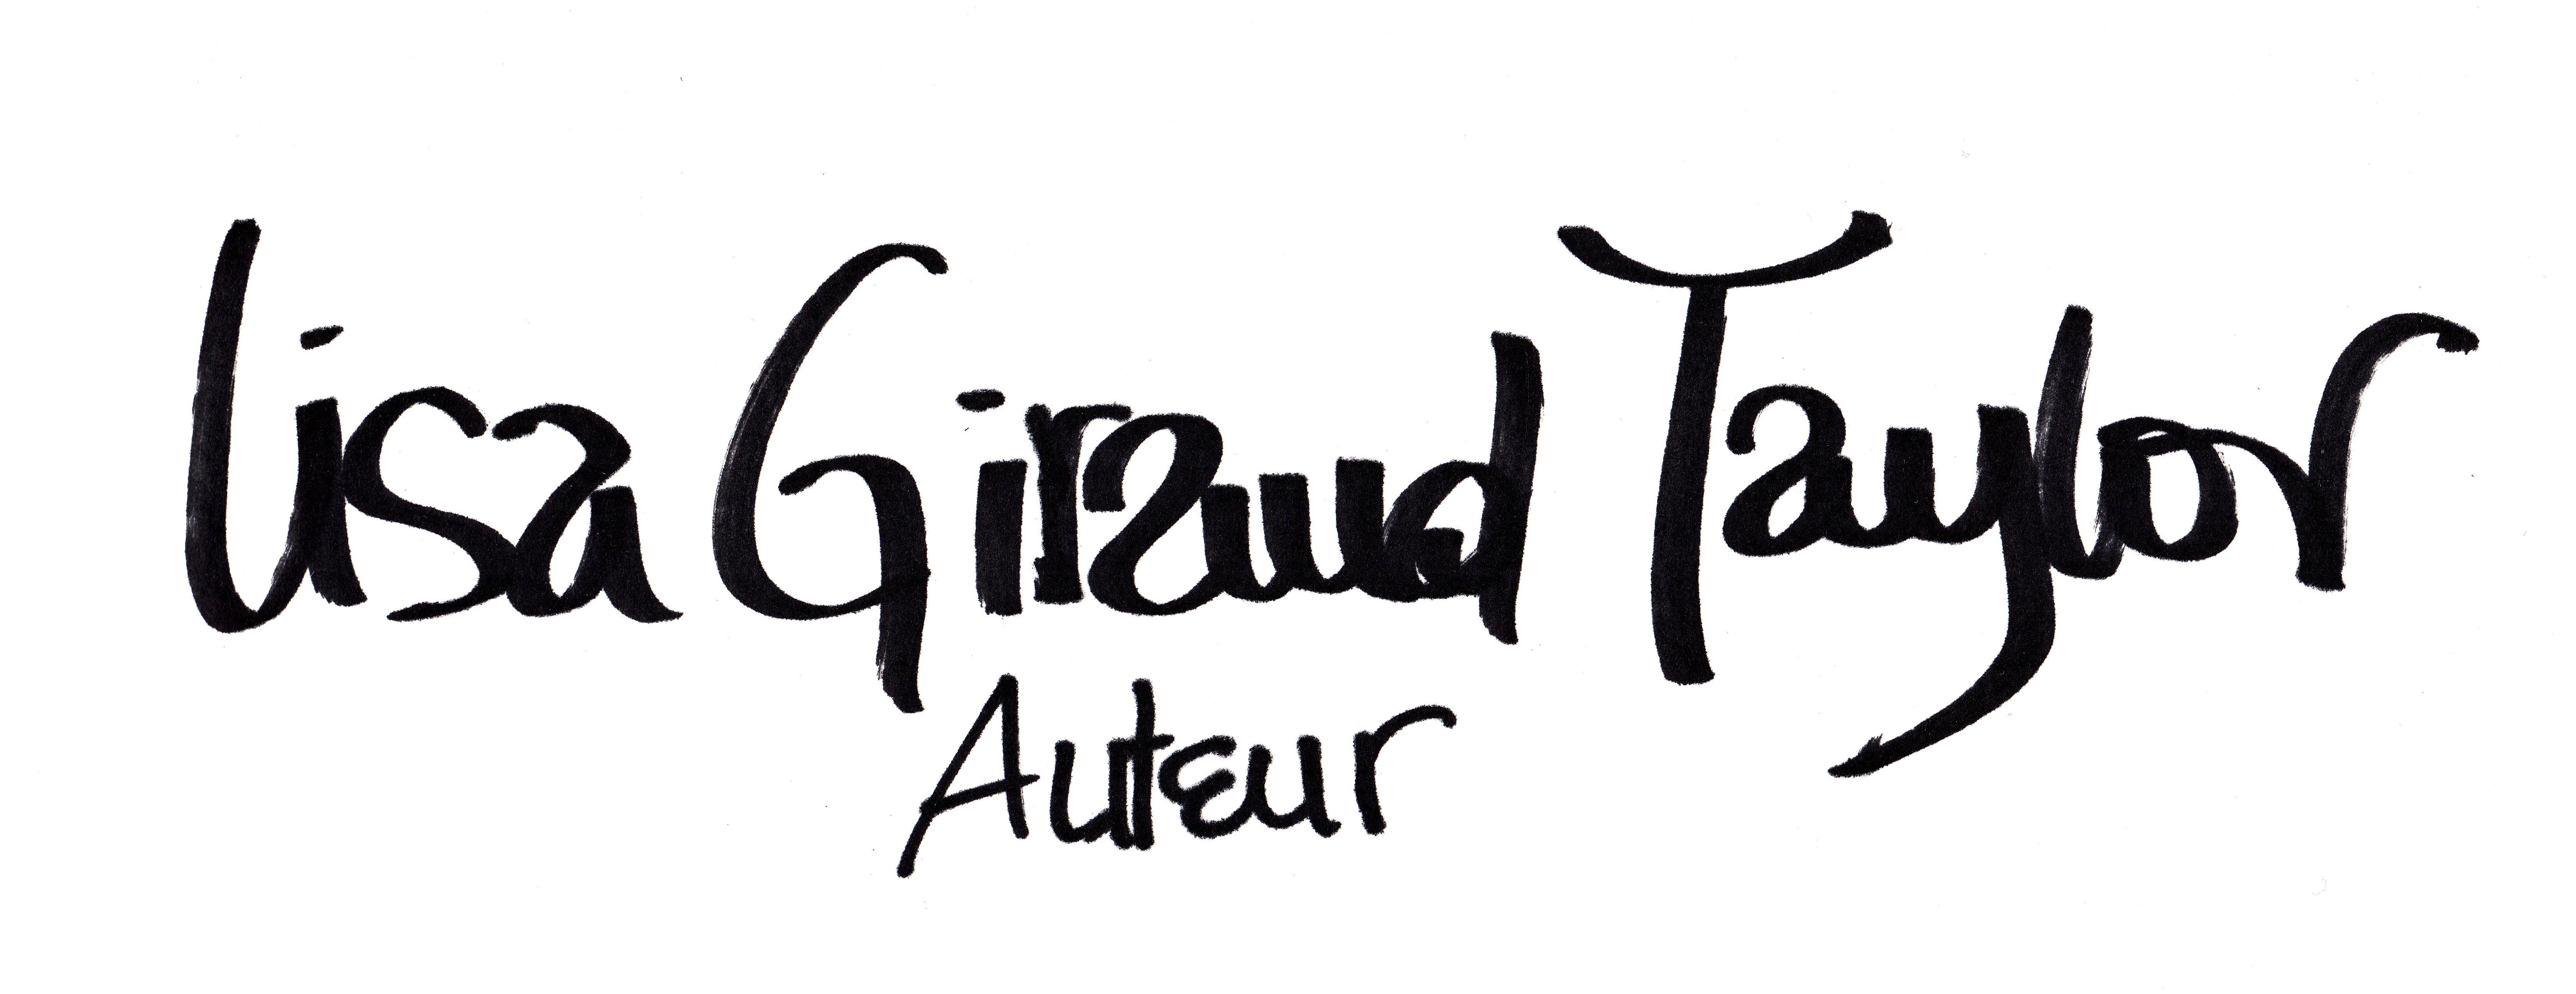 Lisa Giraud Taylor – Auteur